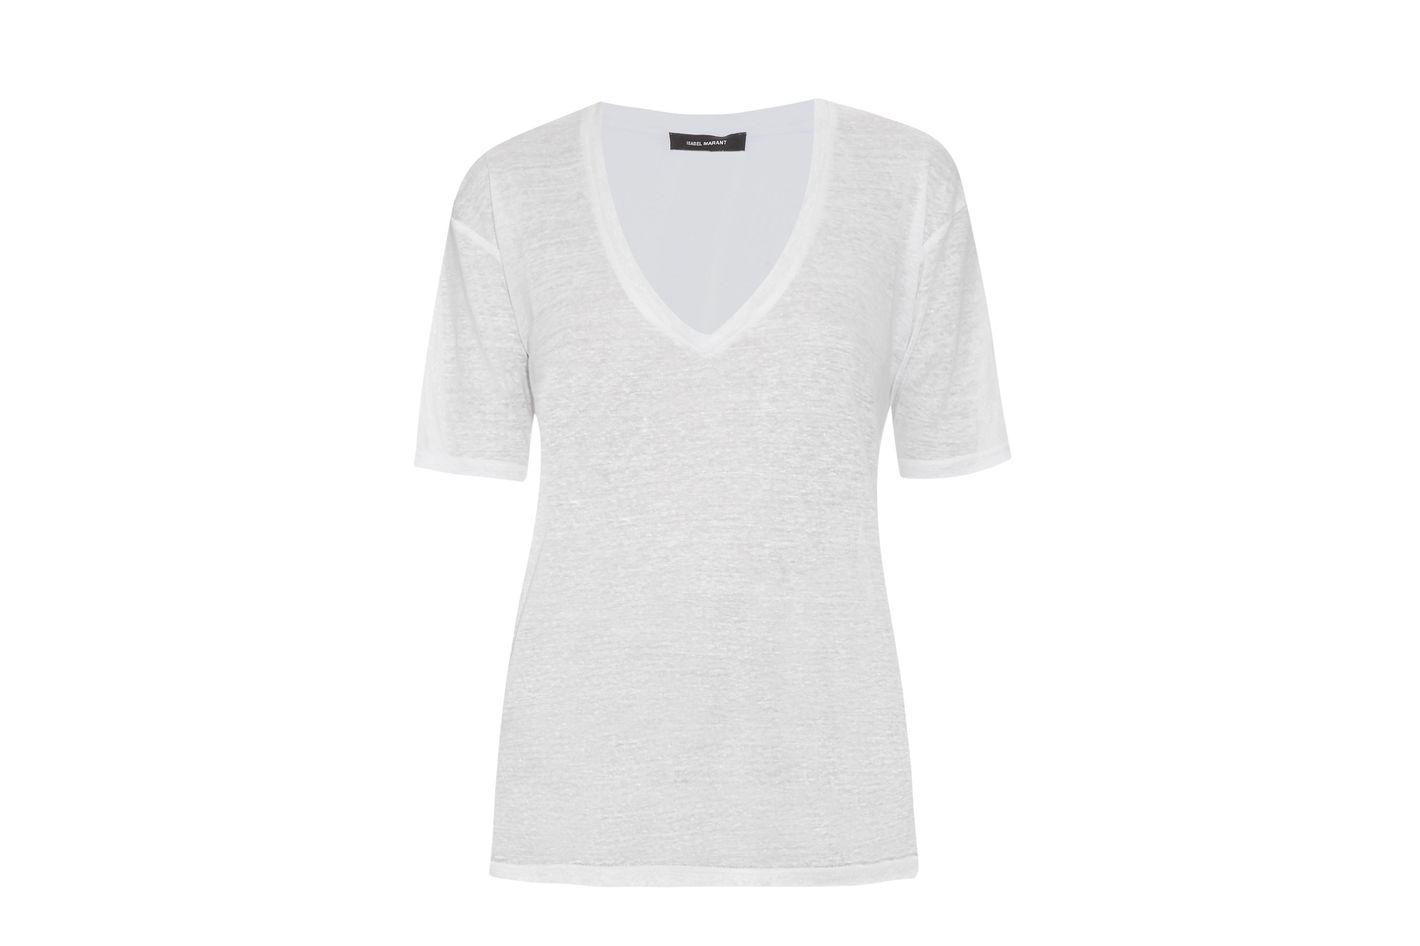 Isabel Marant Maree Short-Sleeved T-shirt